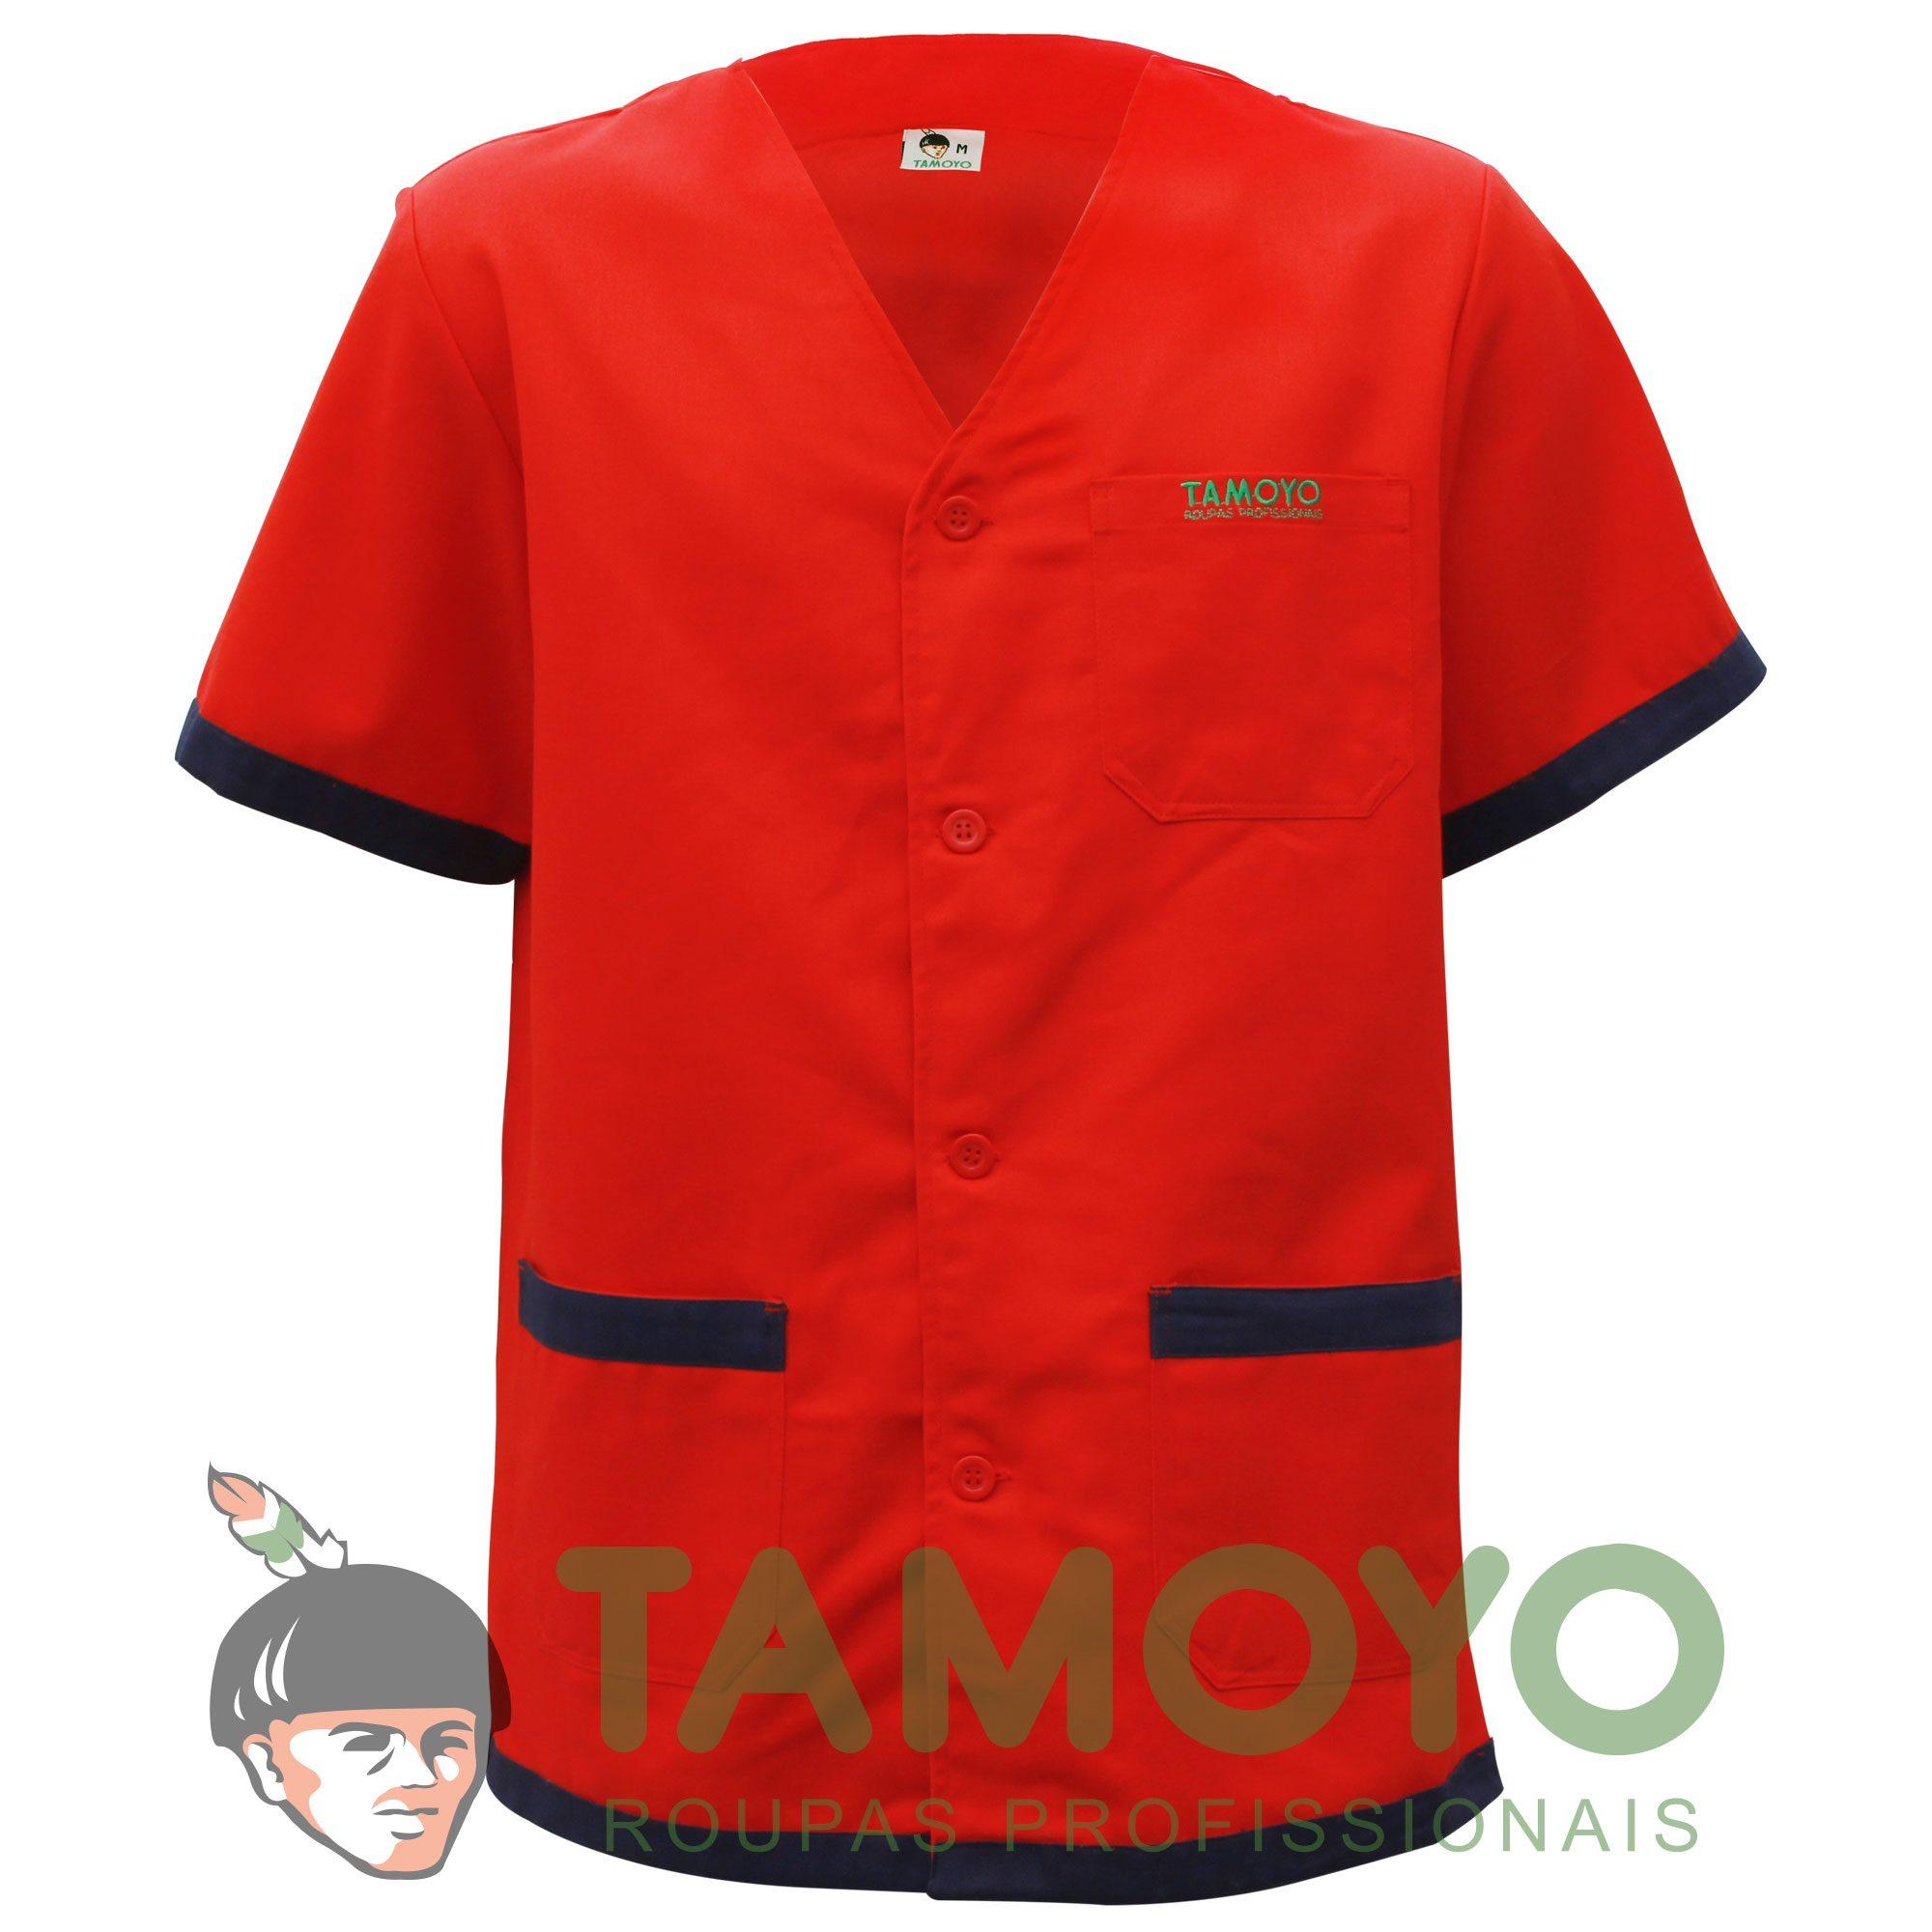 roupas-tamoyo-blusa-jaleco-unissex-industria-servicos-frente-1